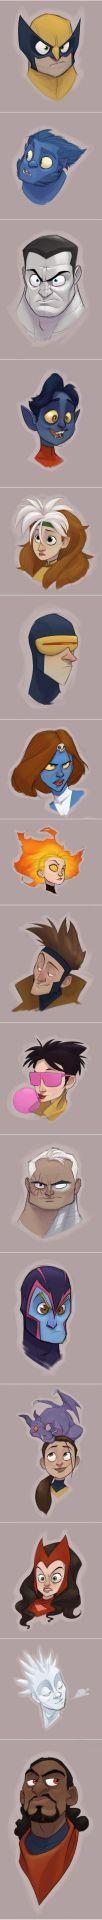 Character Illustrations — Character Illustrations